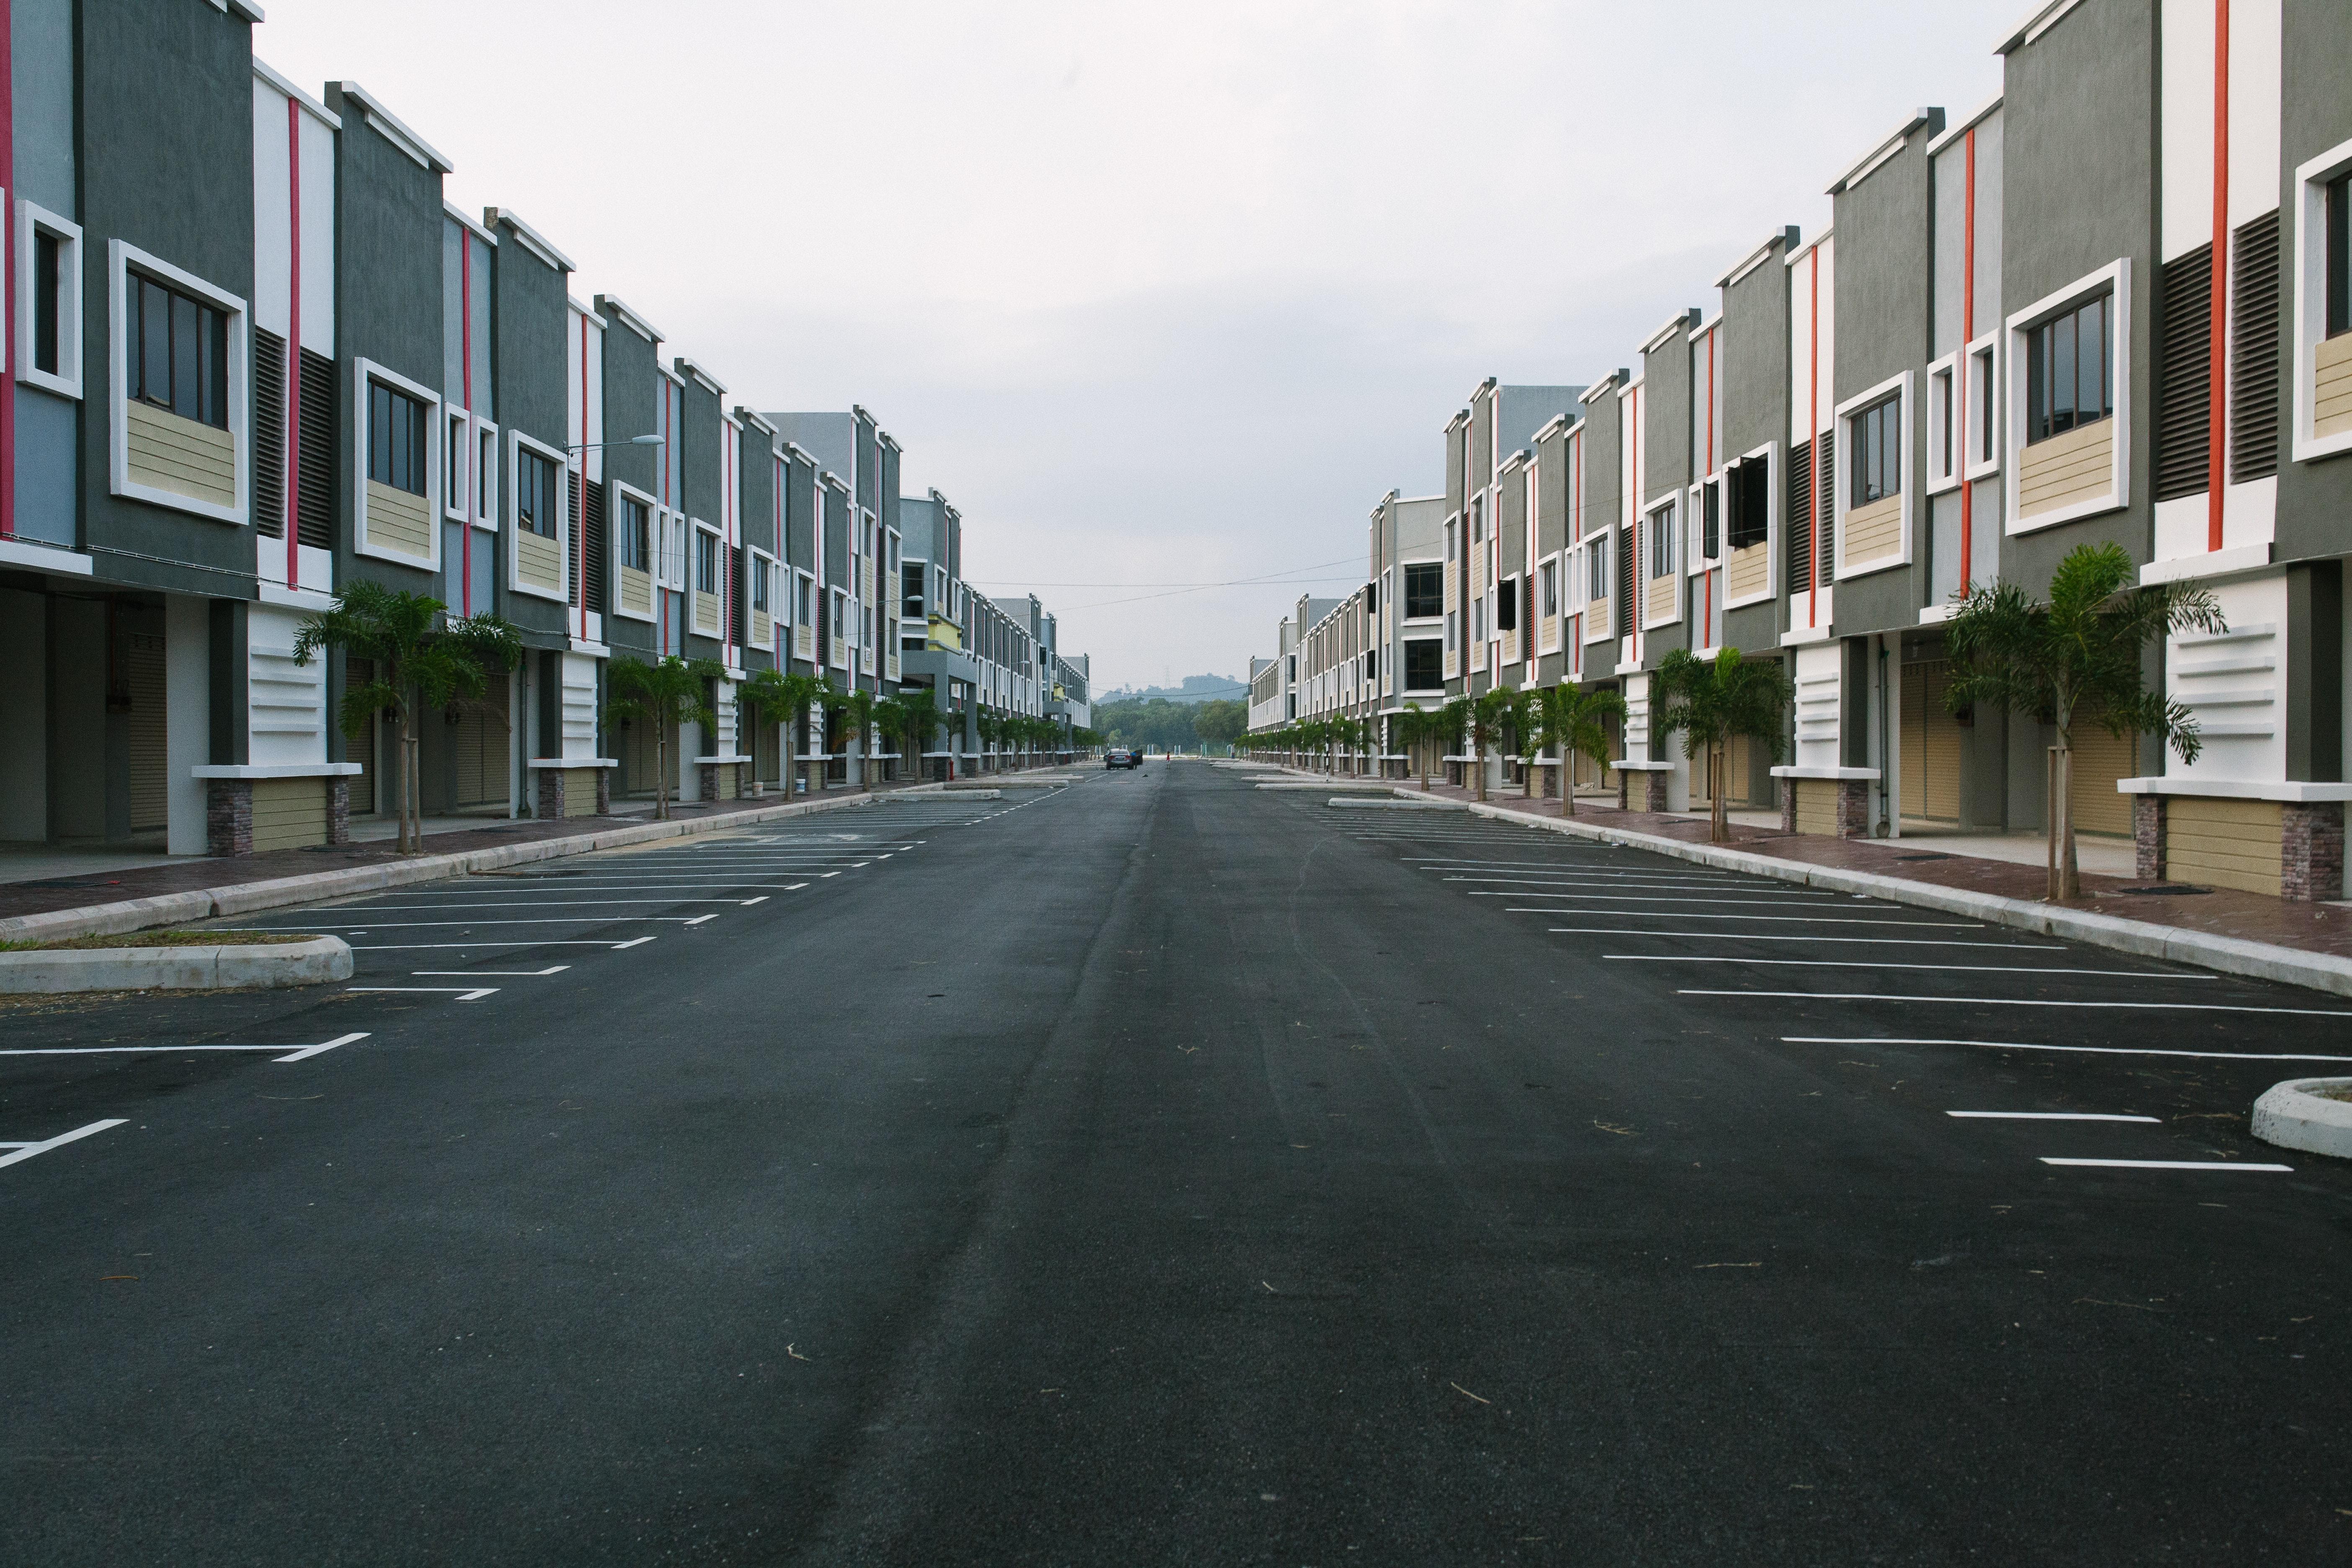 View of city street photo